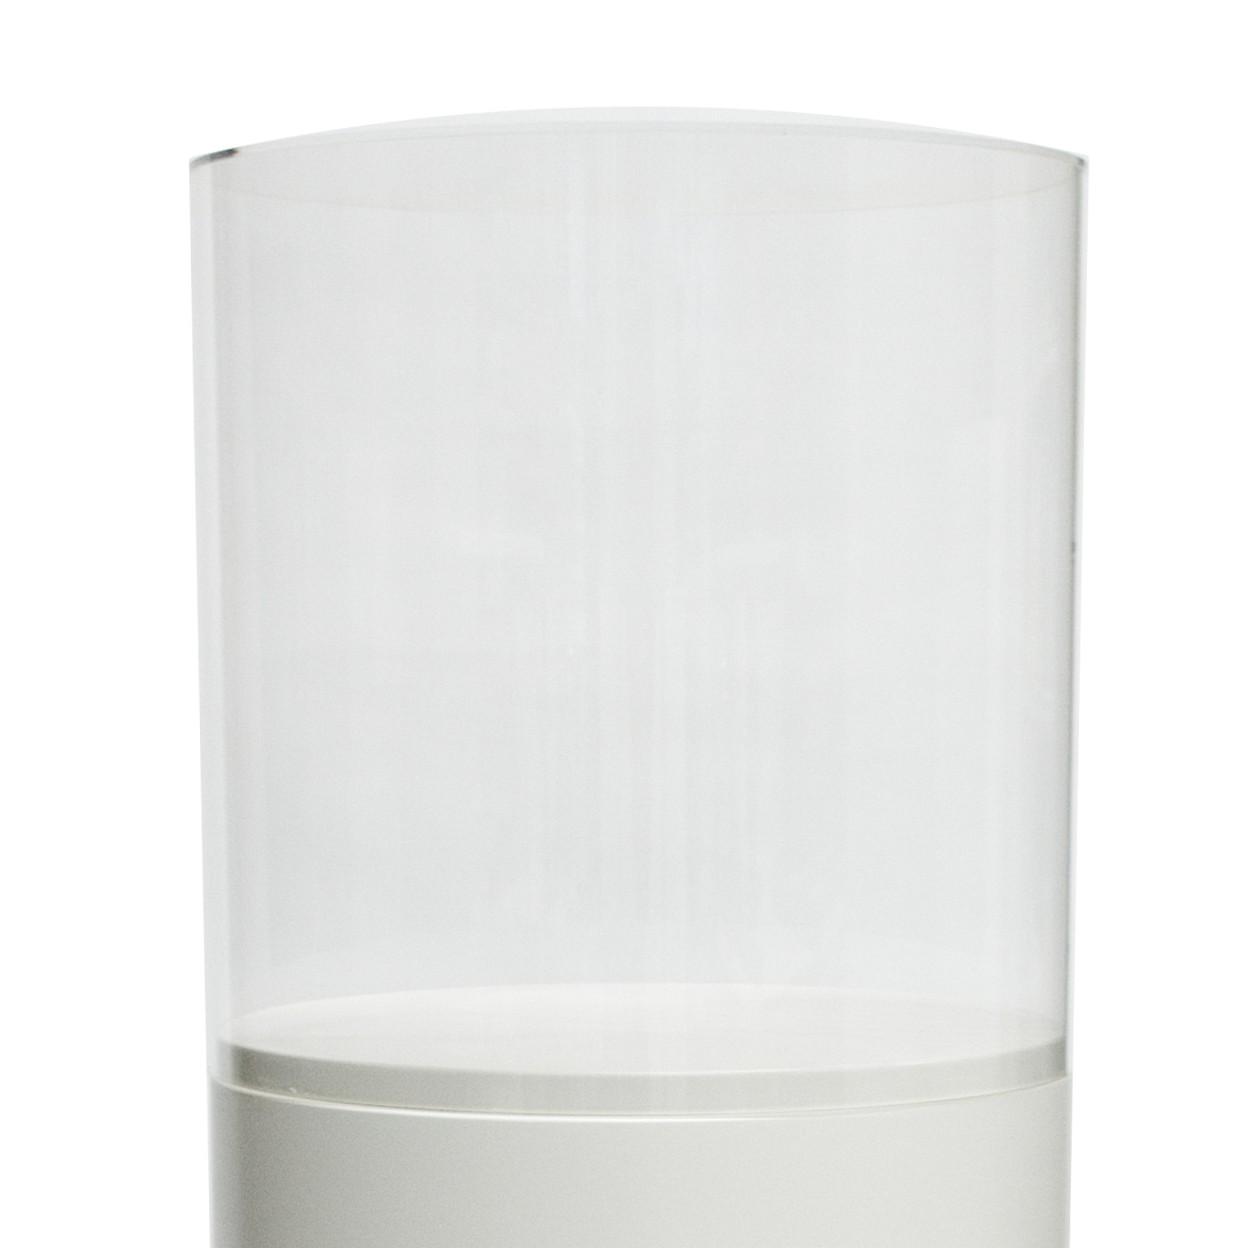 Acrylic display case, round